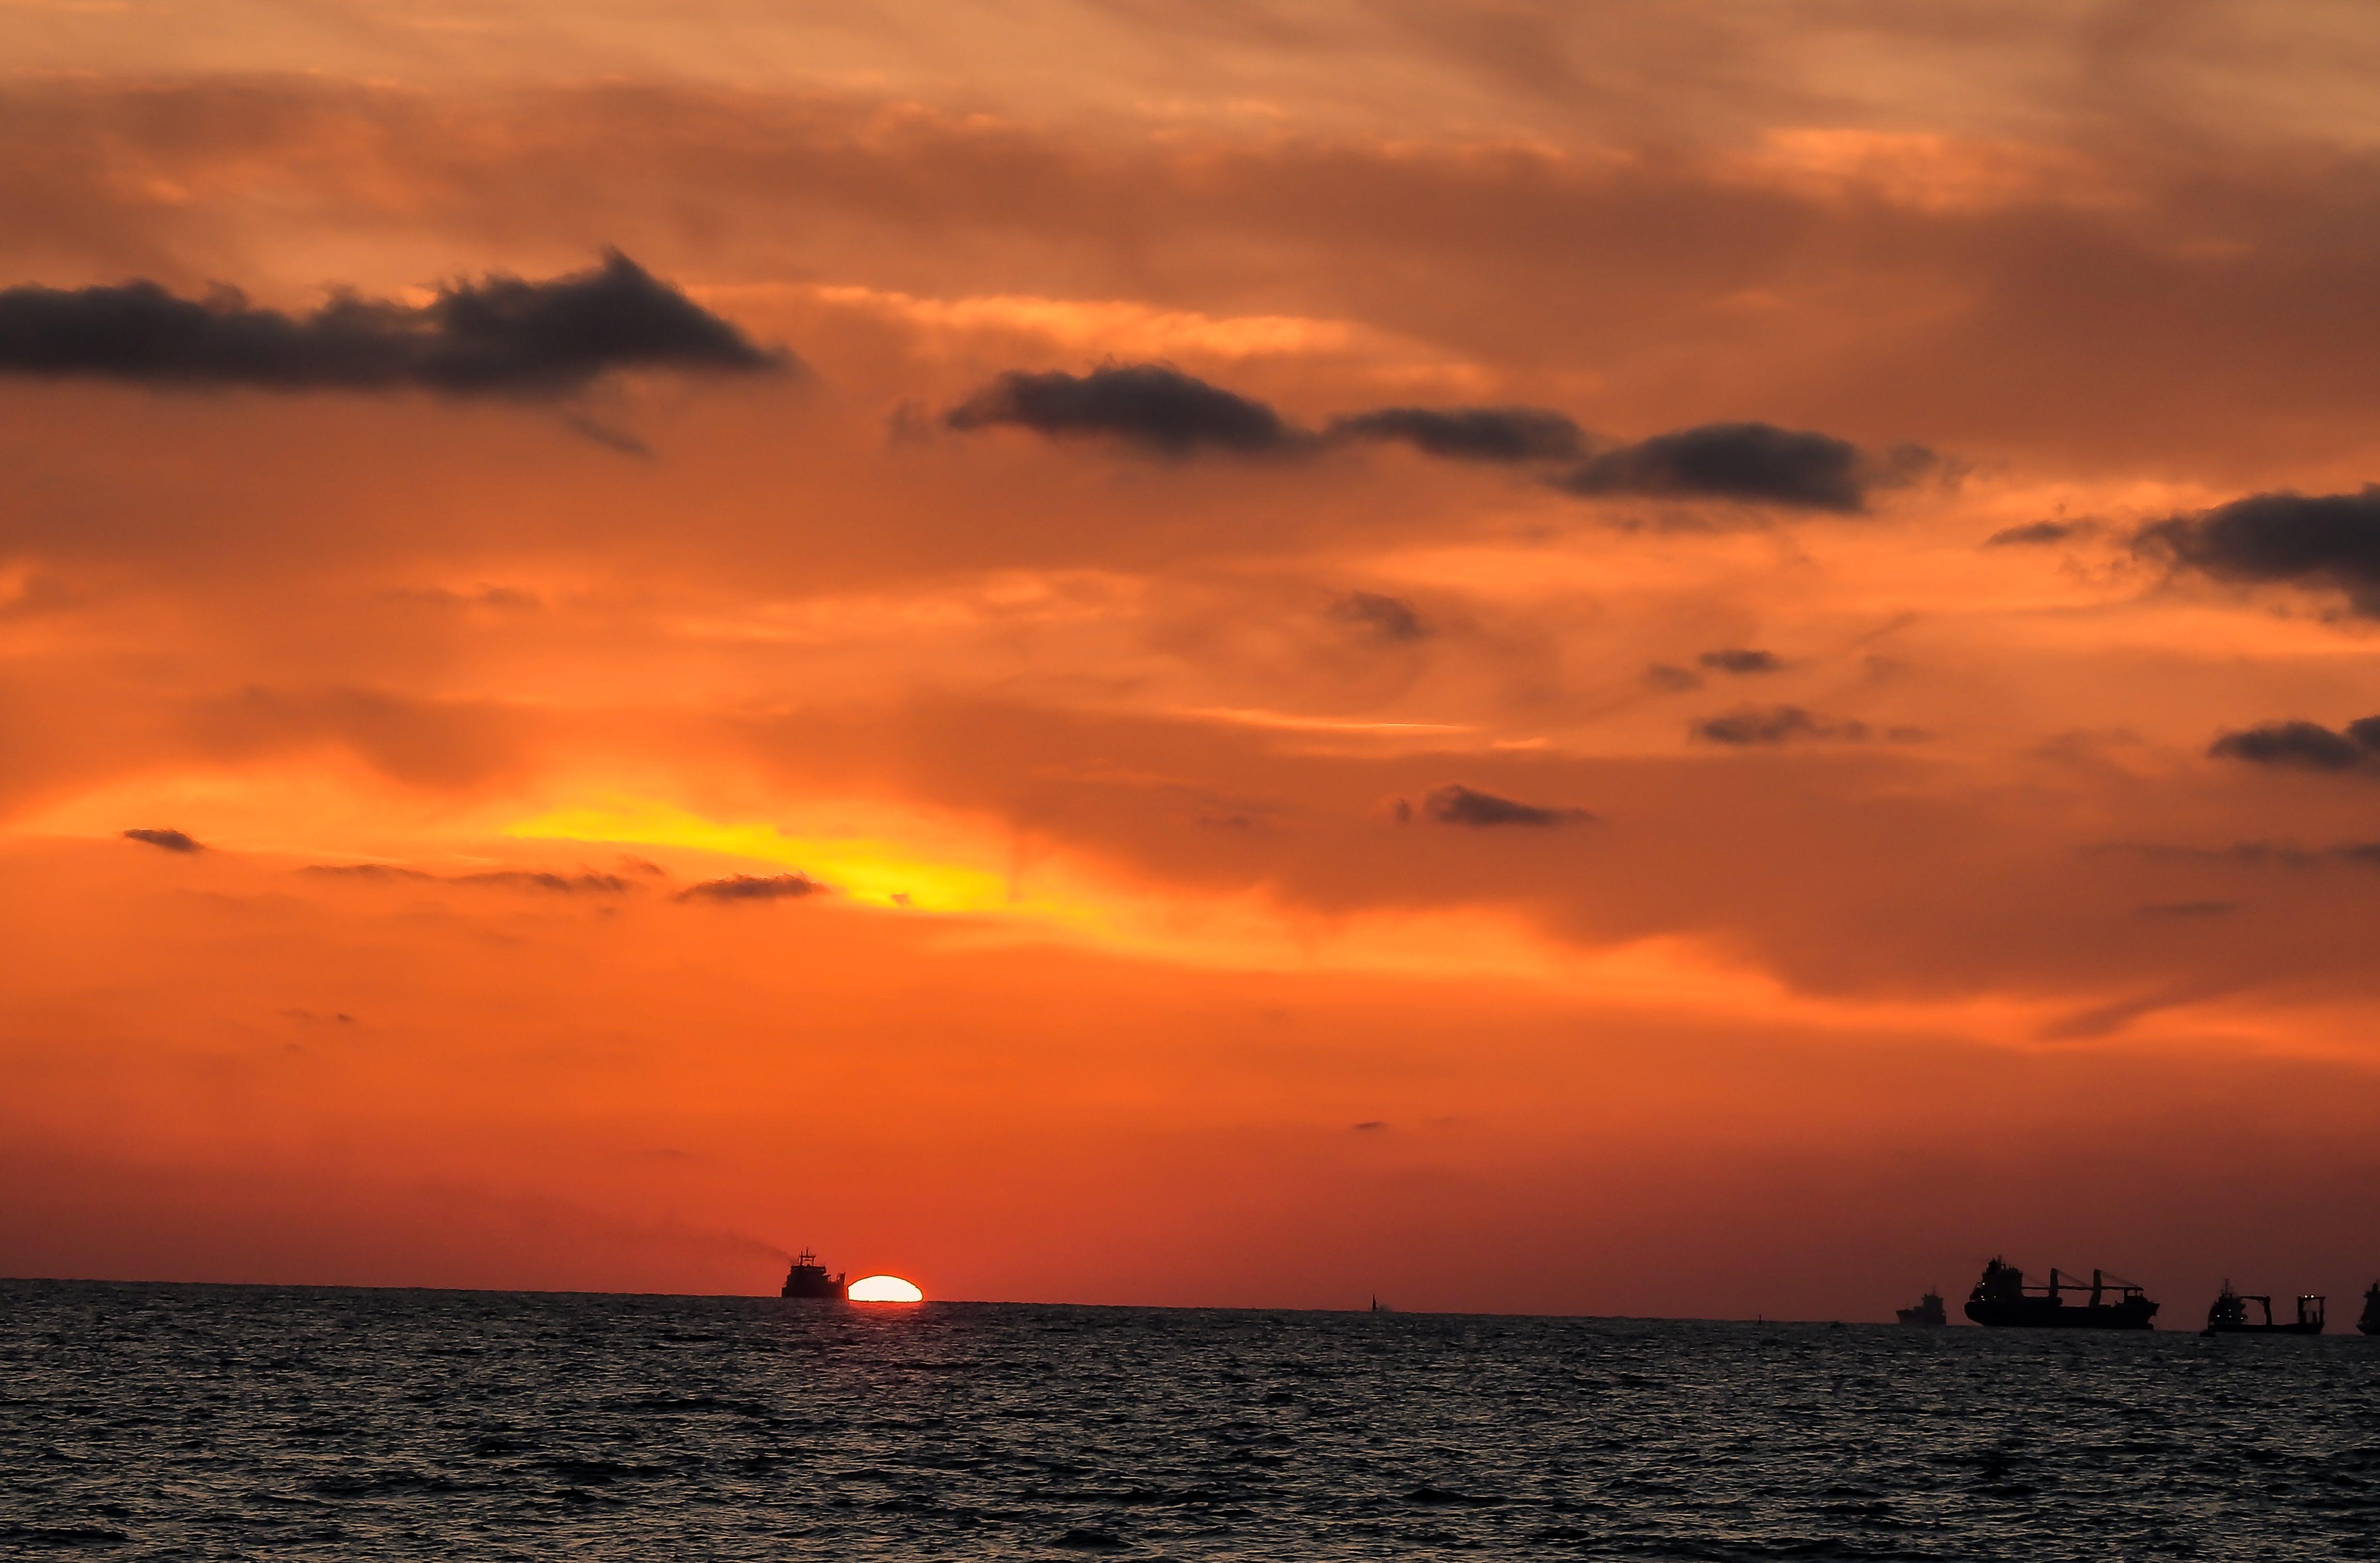 Free stock photo of cargo ship, evening sun, golden sunset, ships